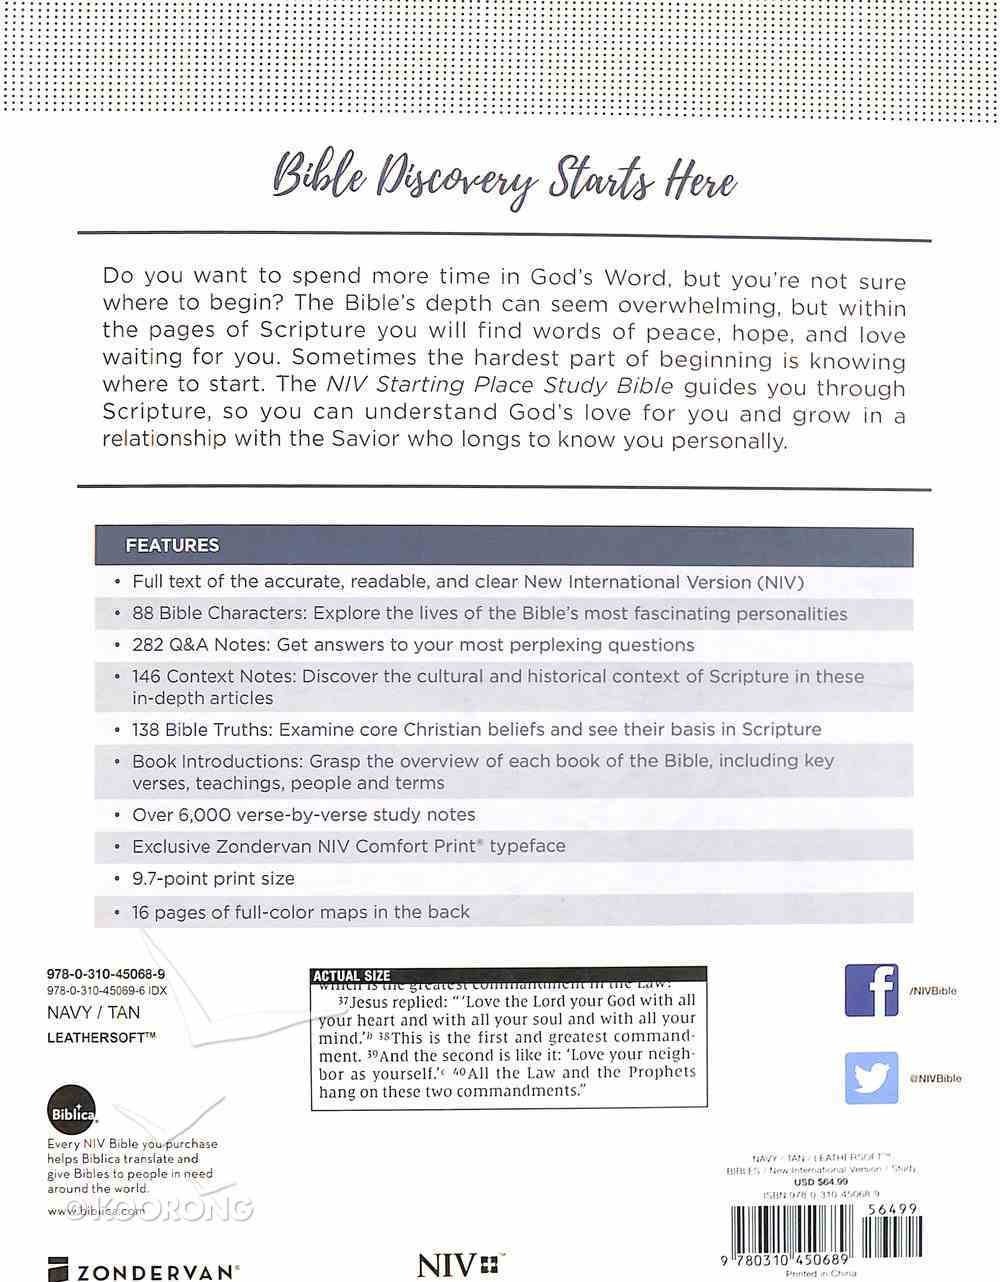 NIV Starting Place Study Bible Blue/Tan Premium Imitation Leather